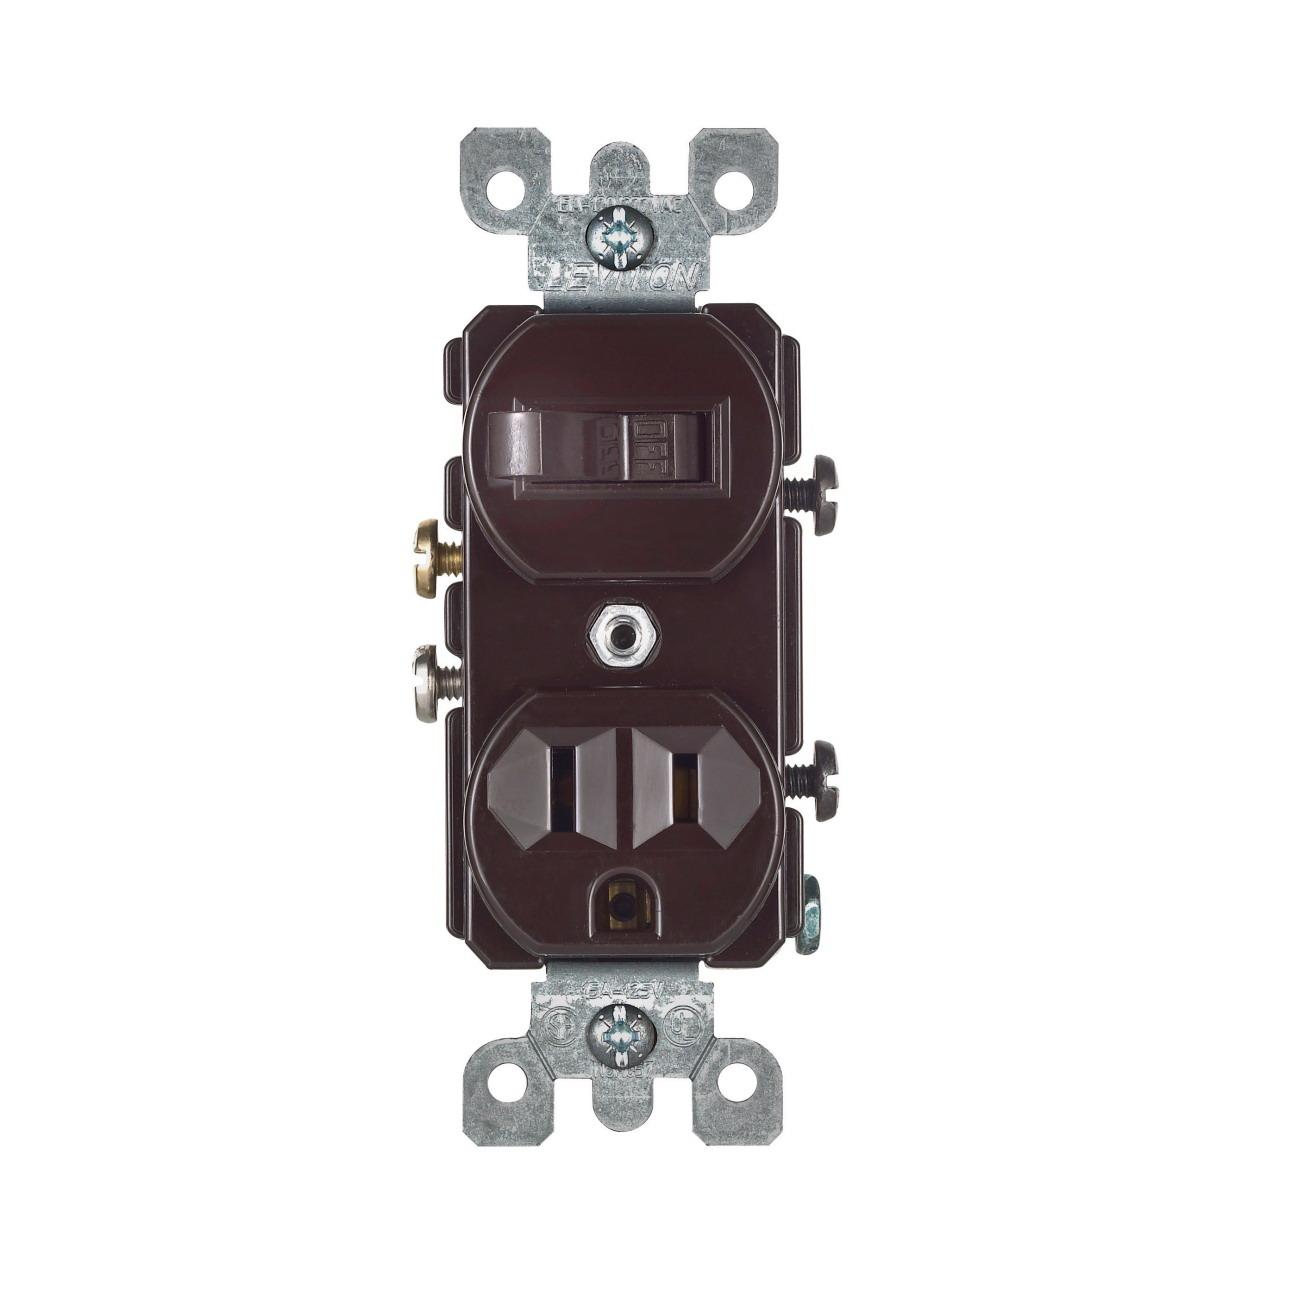 Leviton S00-05225-00S Multi-Purpose Tamper Resistant Combination Switch, 1 P, 15 A, 120 VAC